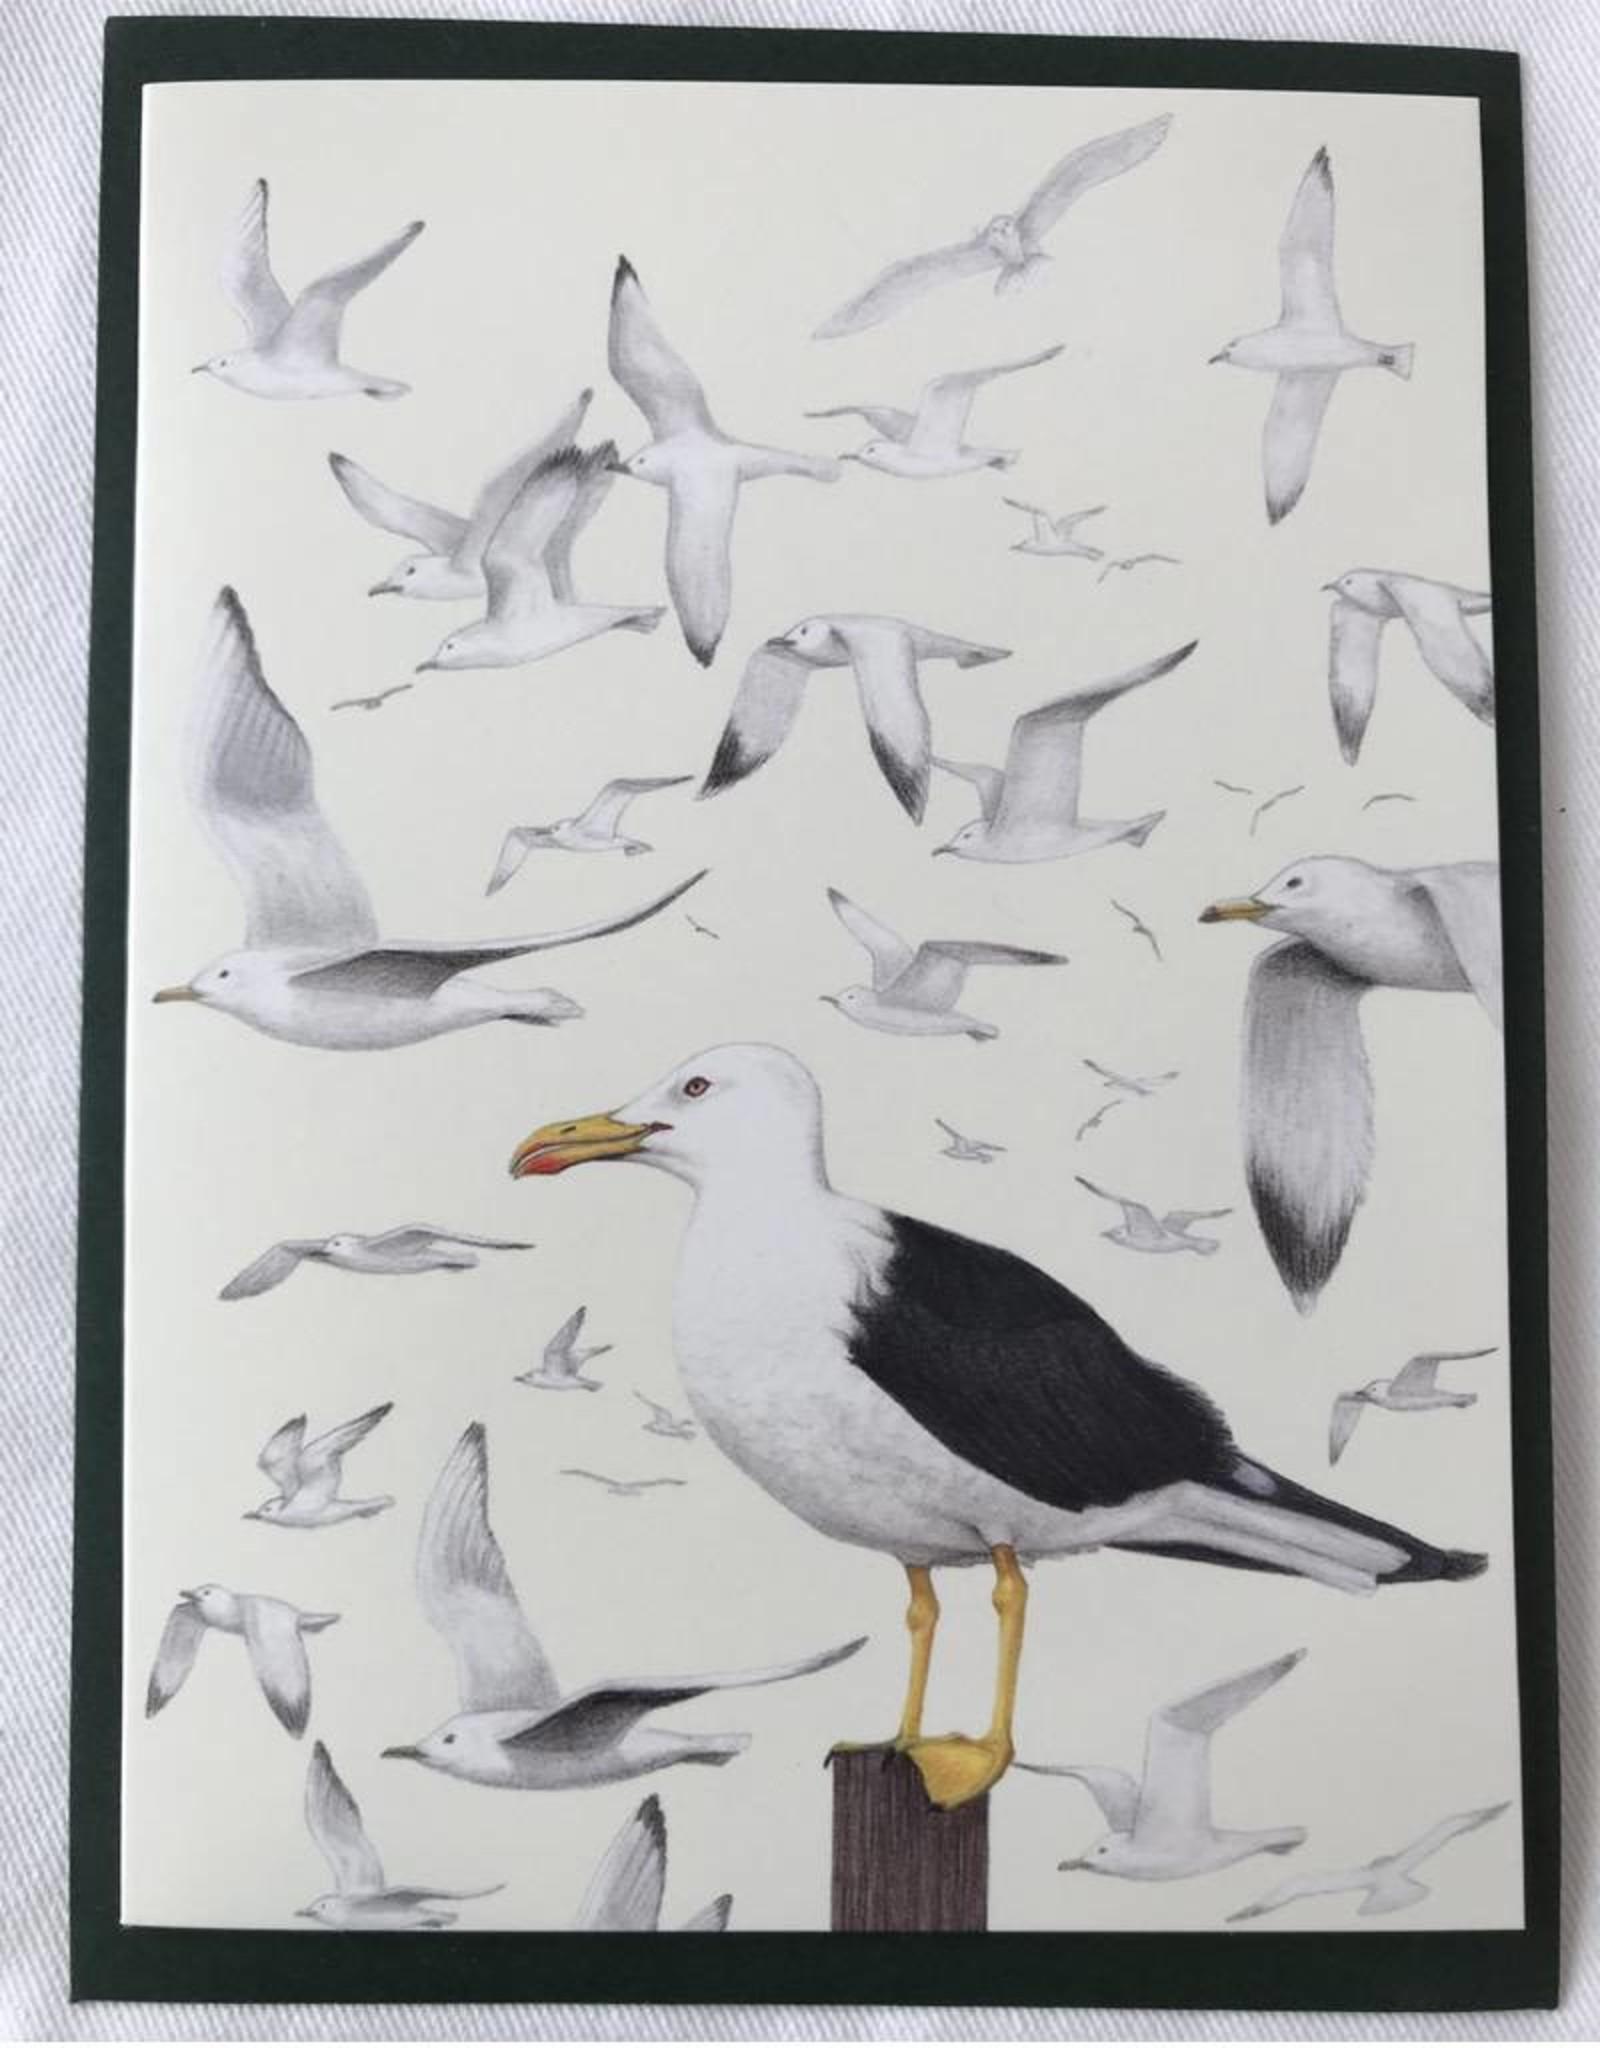 TBL13 Seagulls